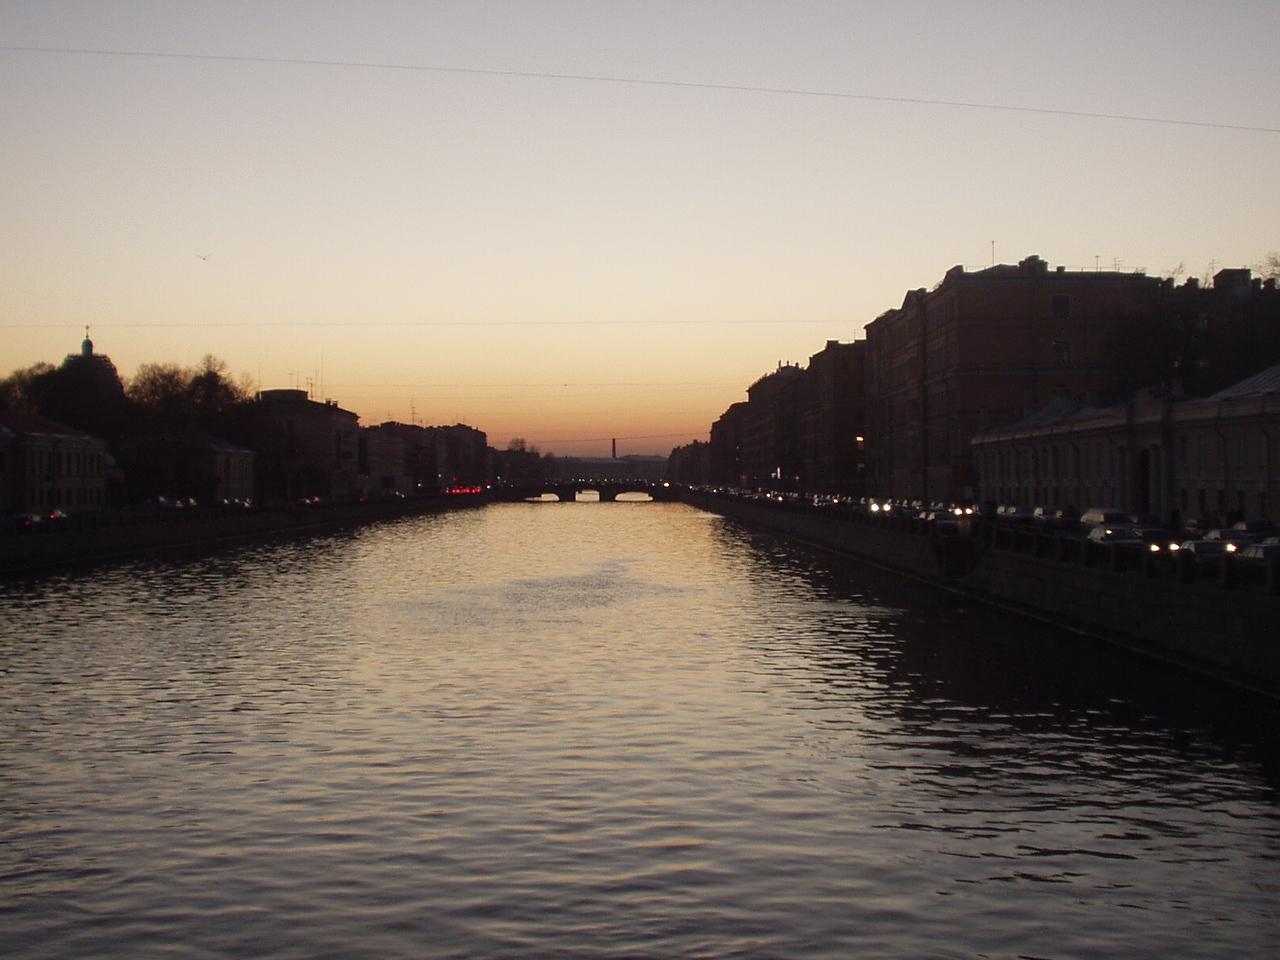 canals03.jpg